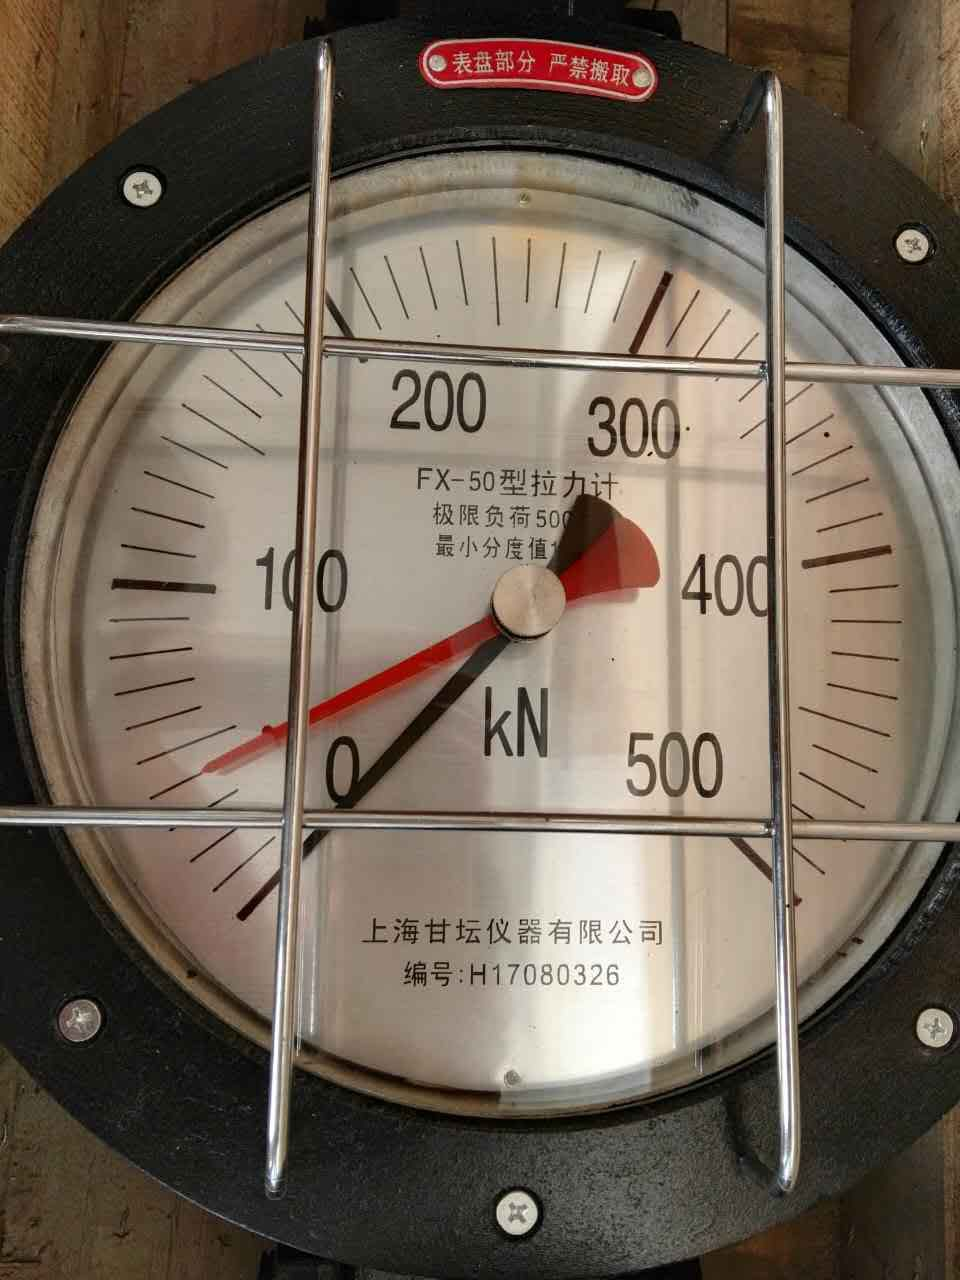 FX-200KN指针测力计- 煤矿用20T机械式拉力表